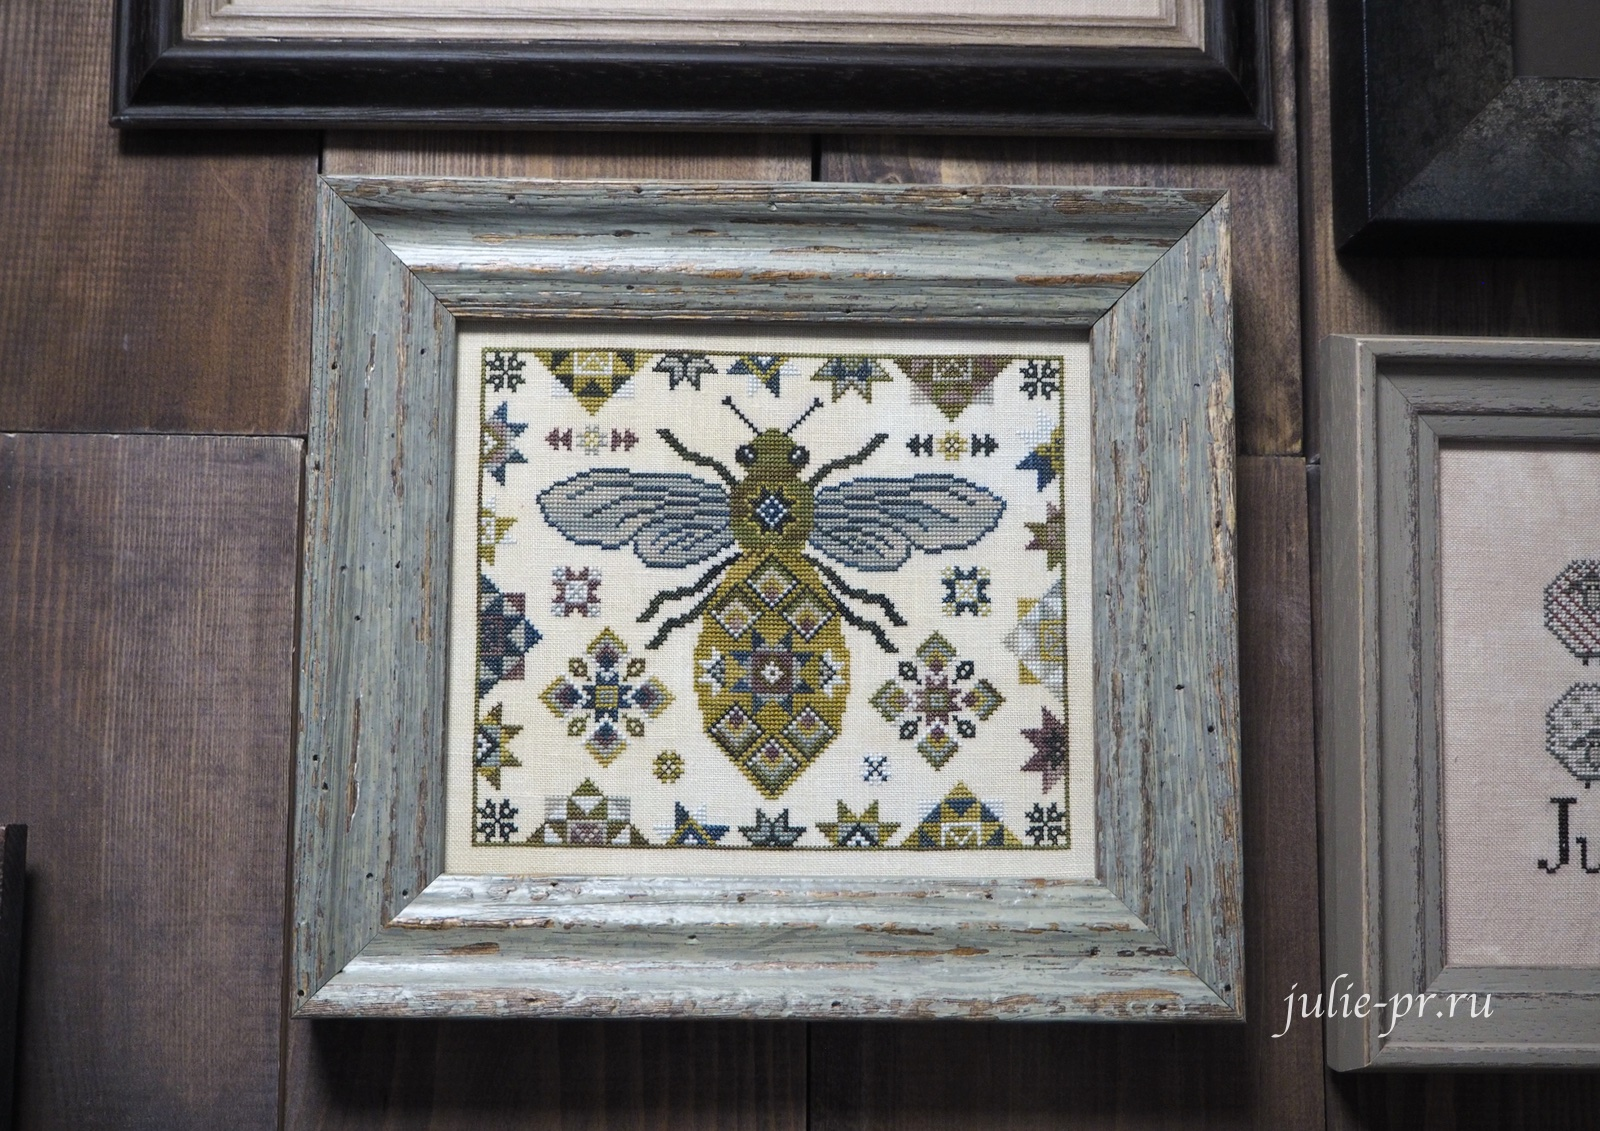 вышивка крестом, примитивы, The Blue Flower, Quilting Bee, пчела